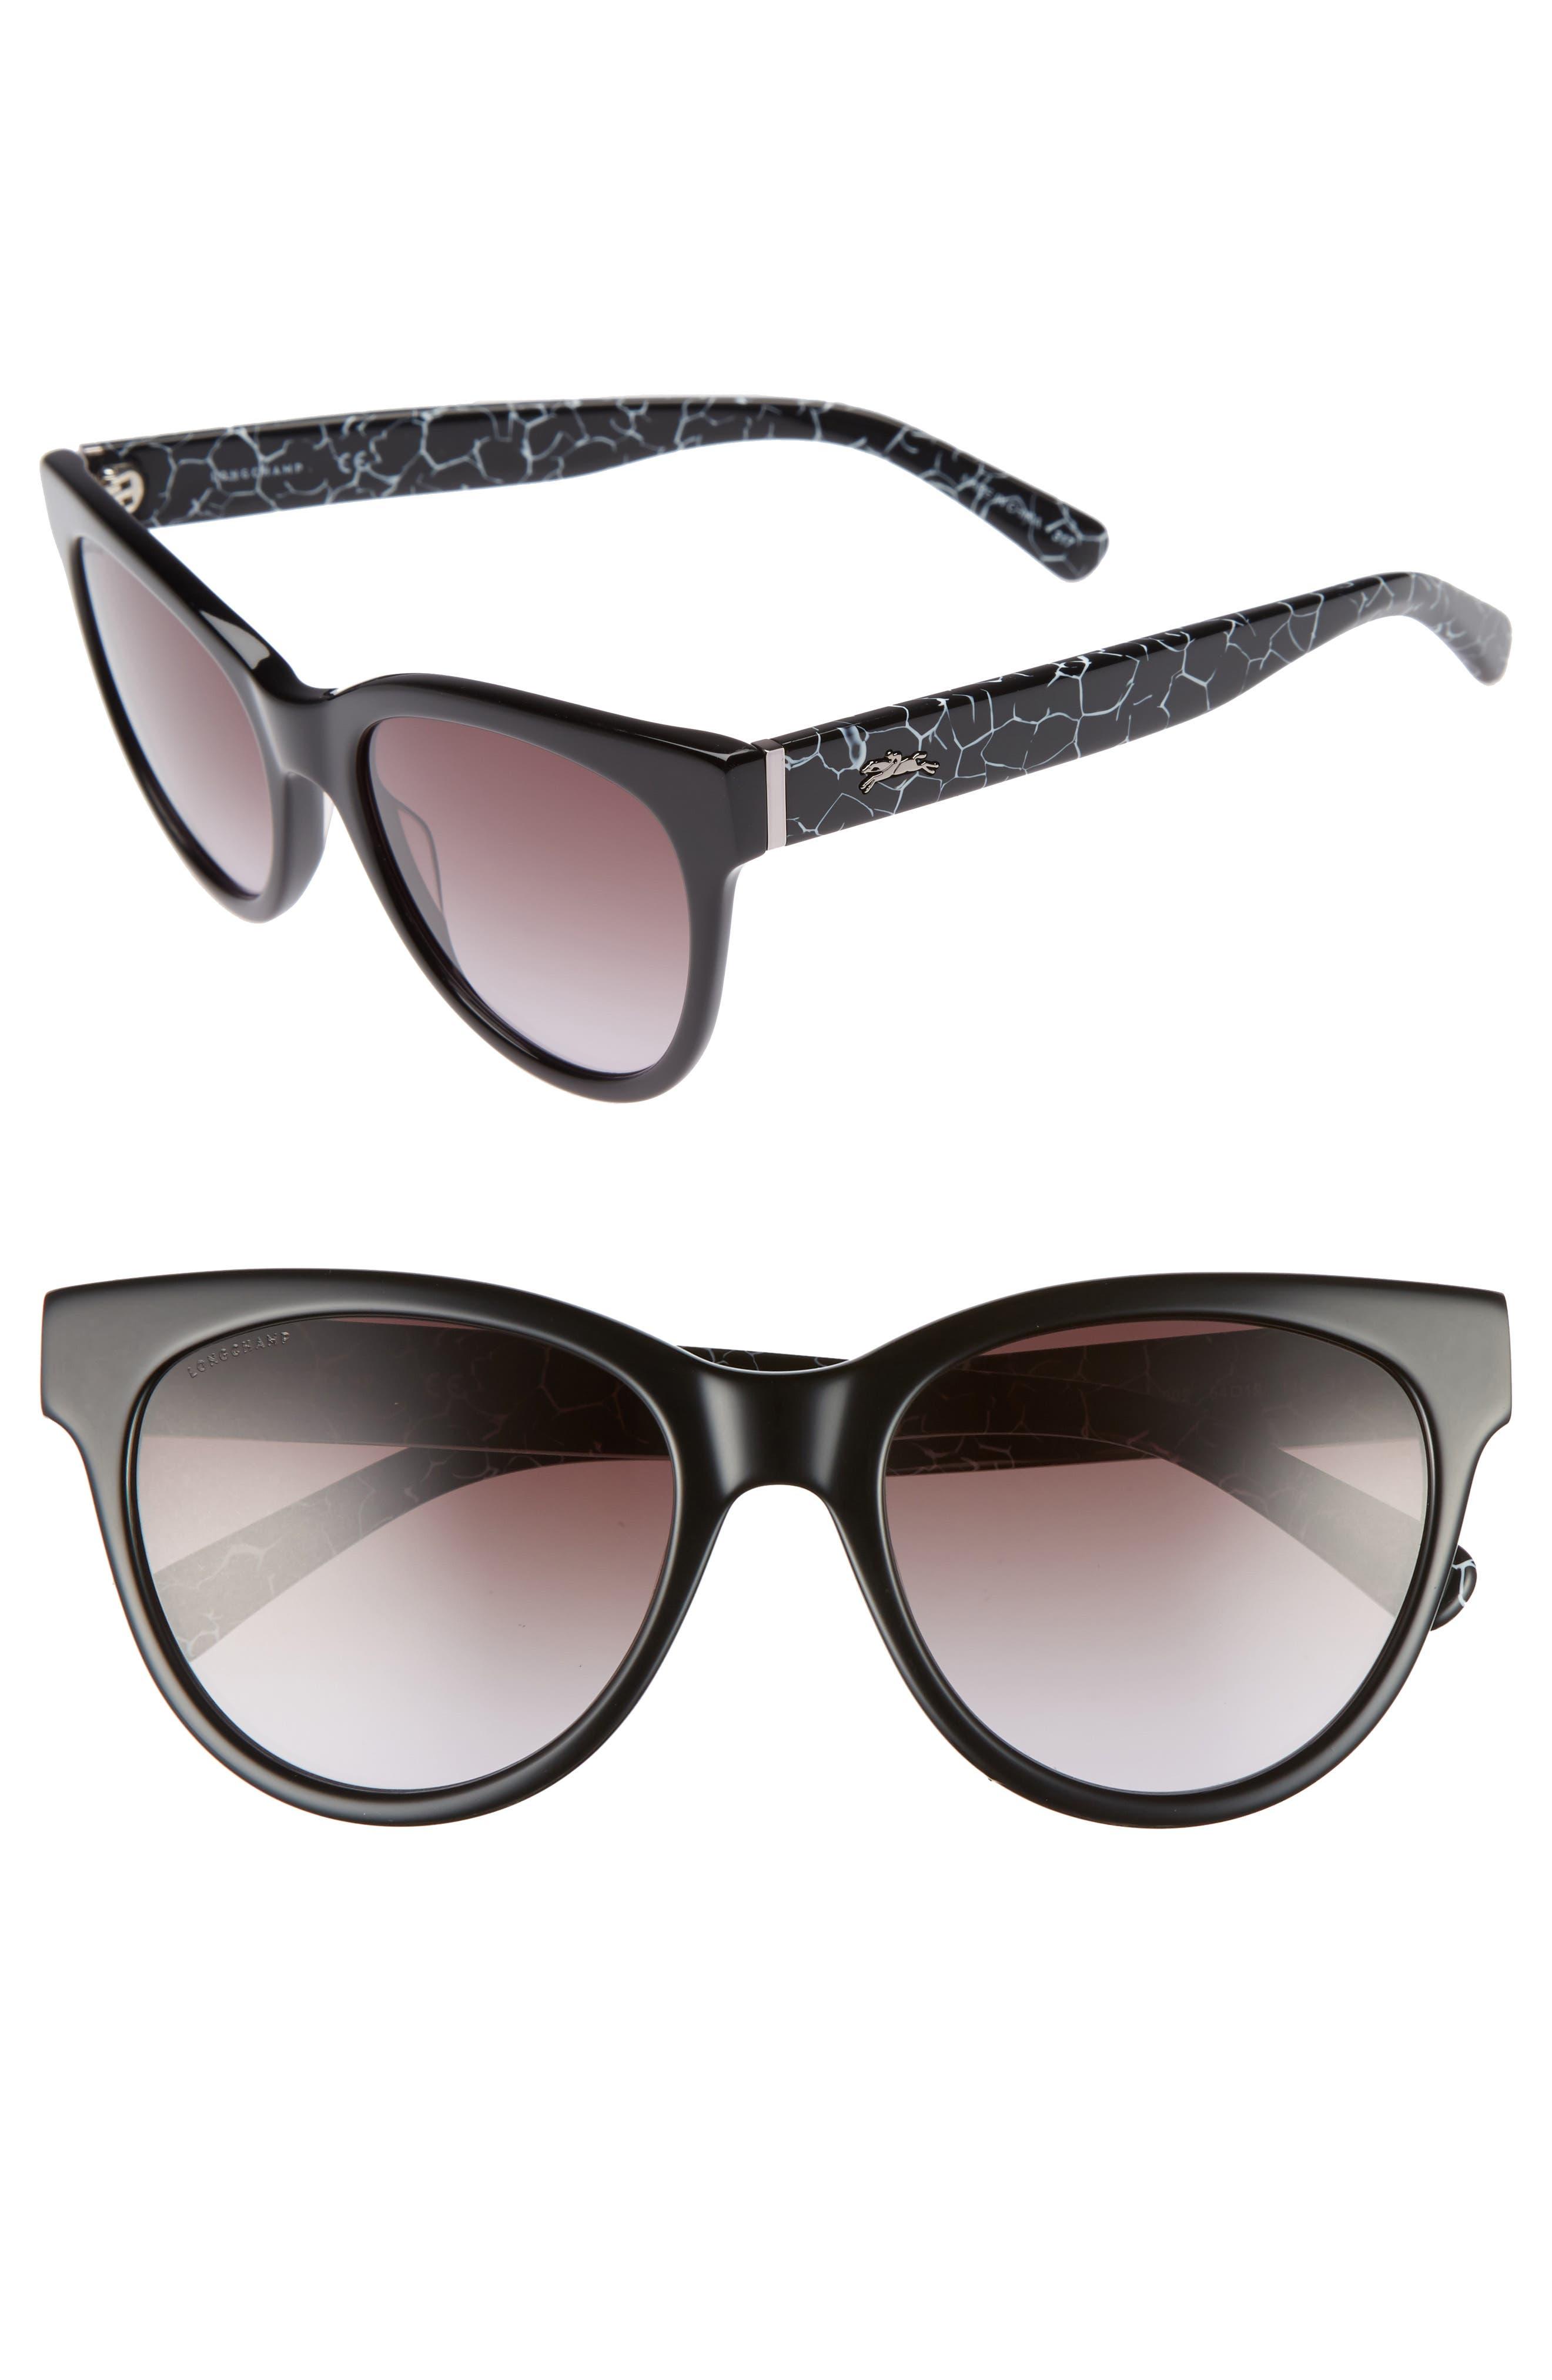 54mm Gradient Lens Cat Eye Sunglasses,                             Main thumbnail 1, color,                             MARBLE BLACK